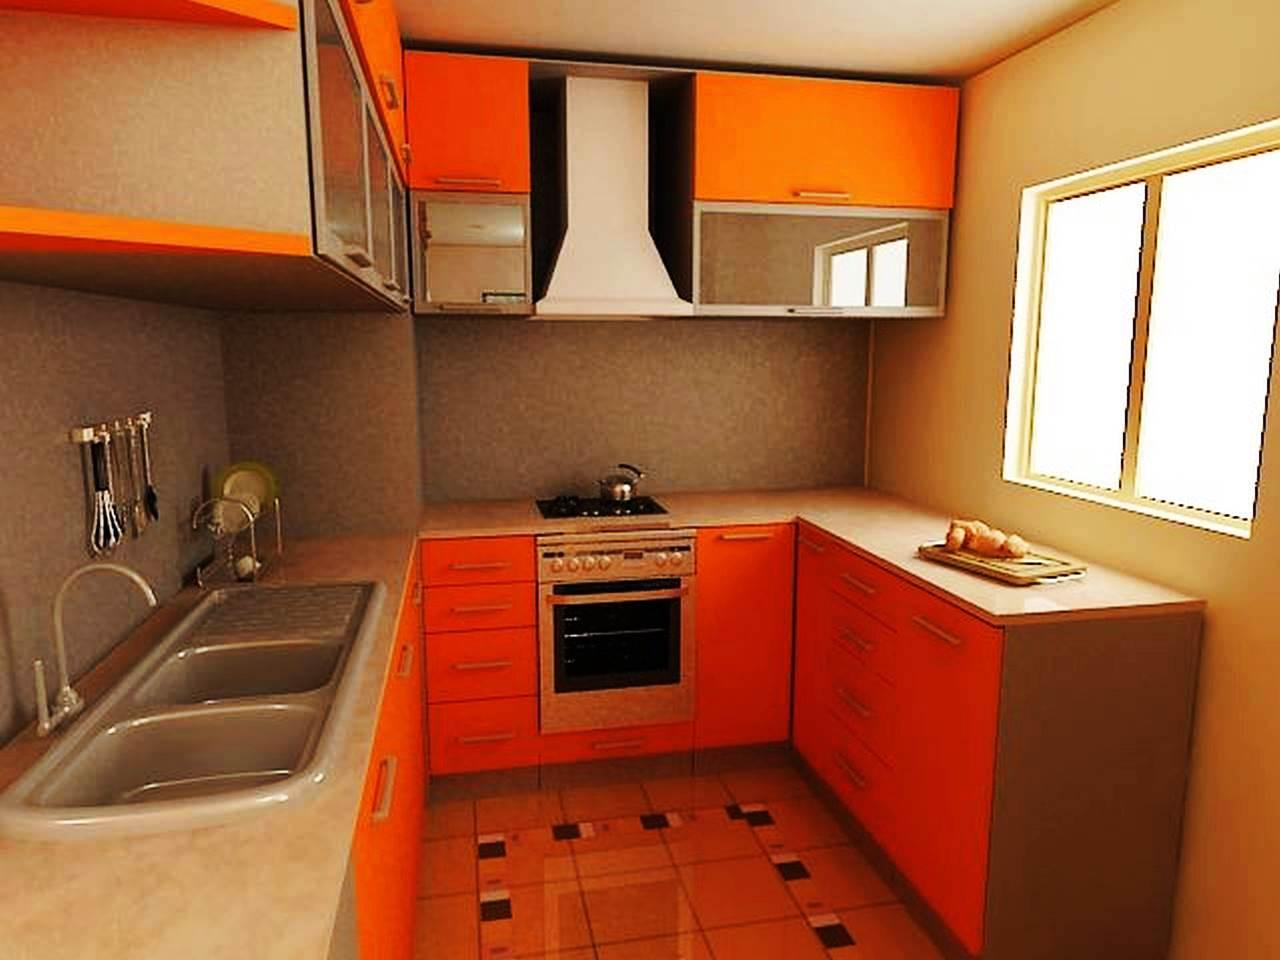 Кухонный ремонт дизайн